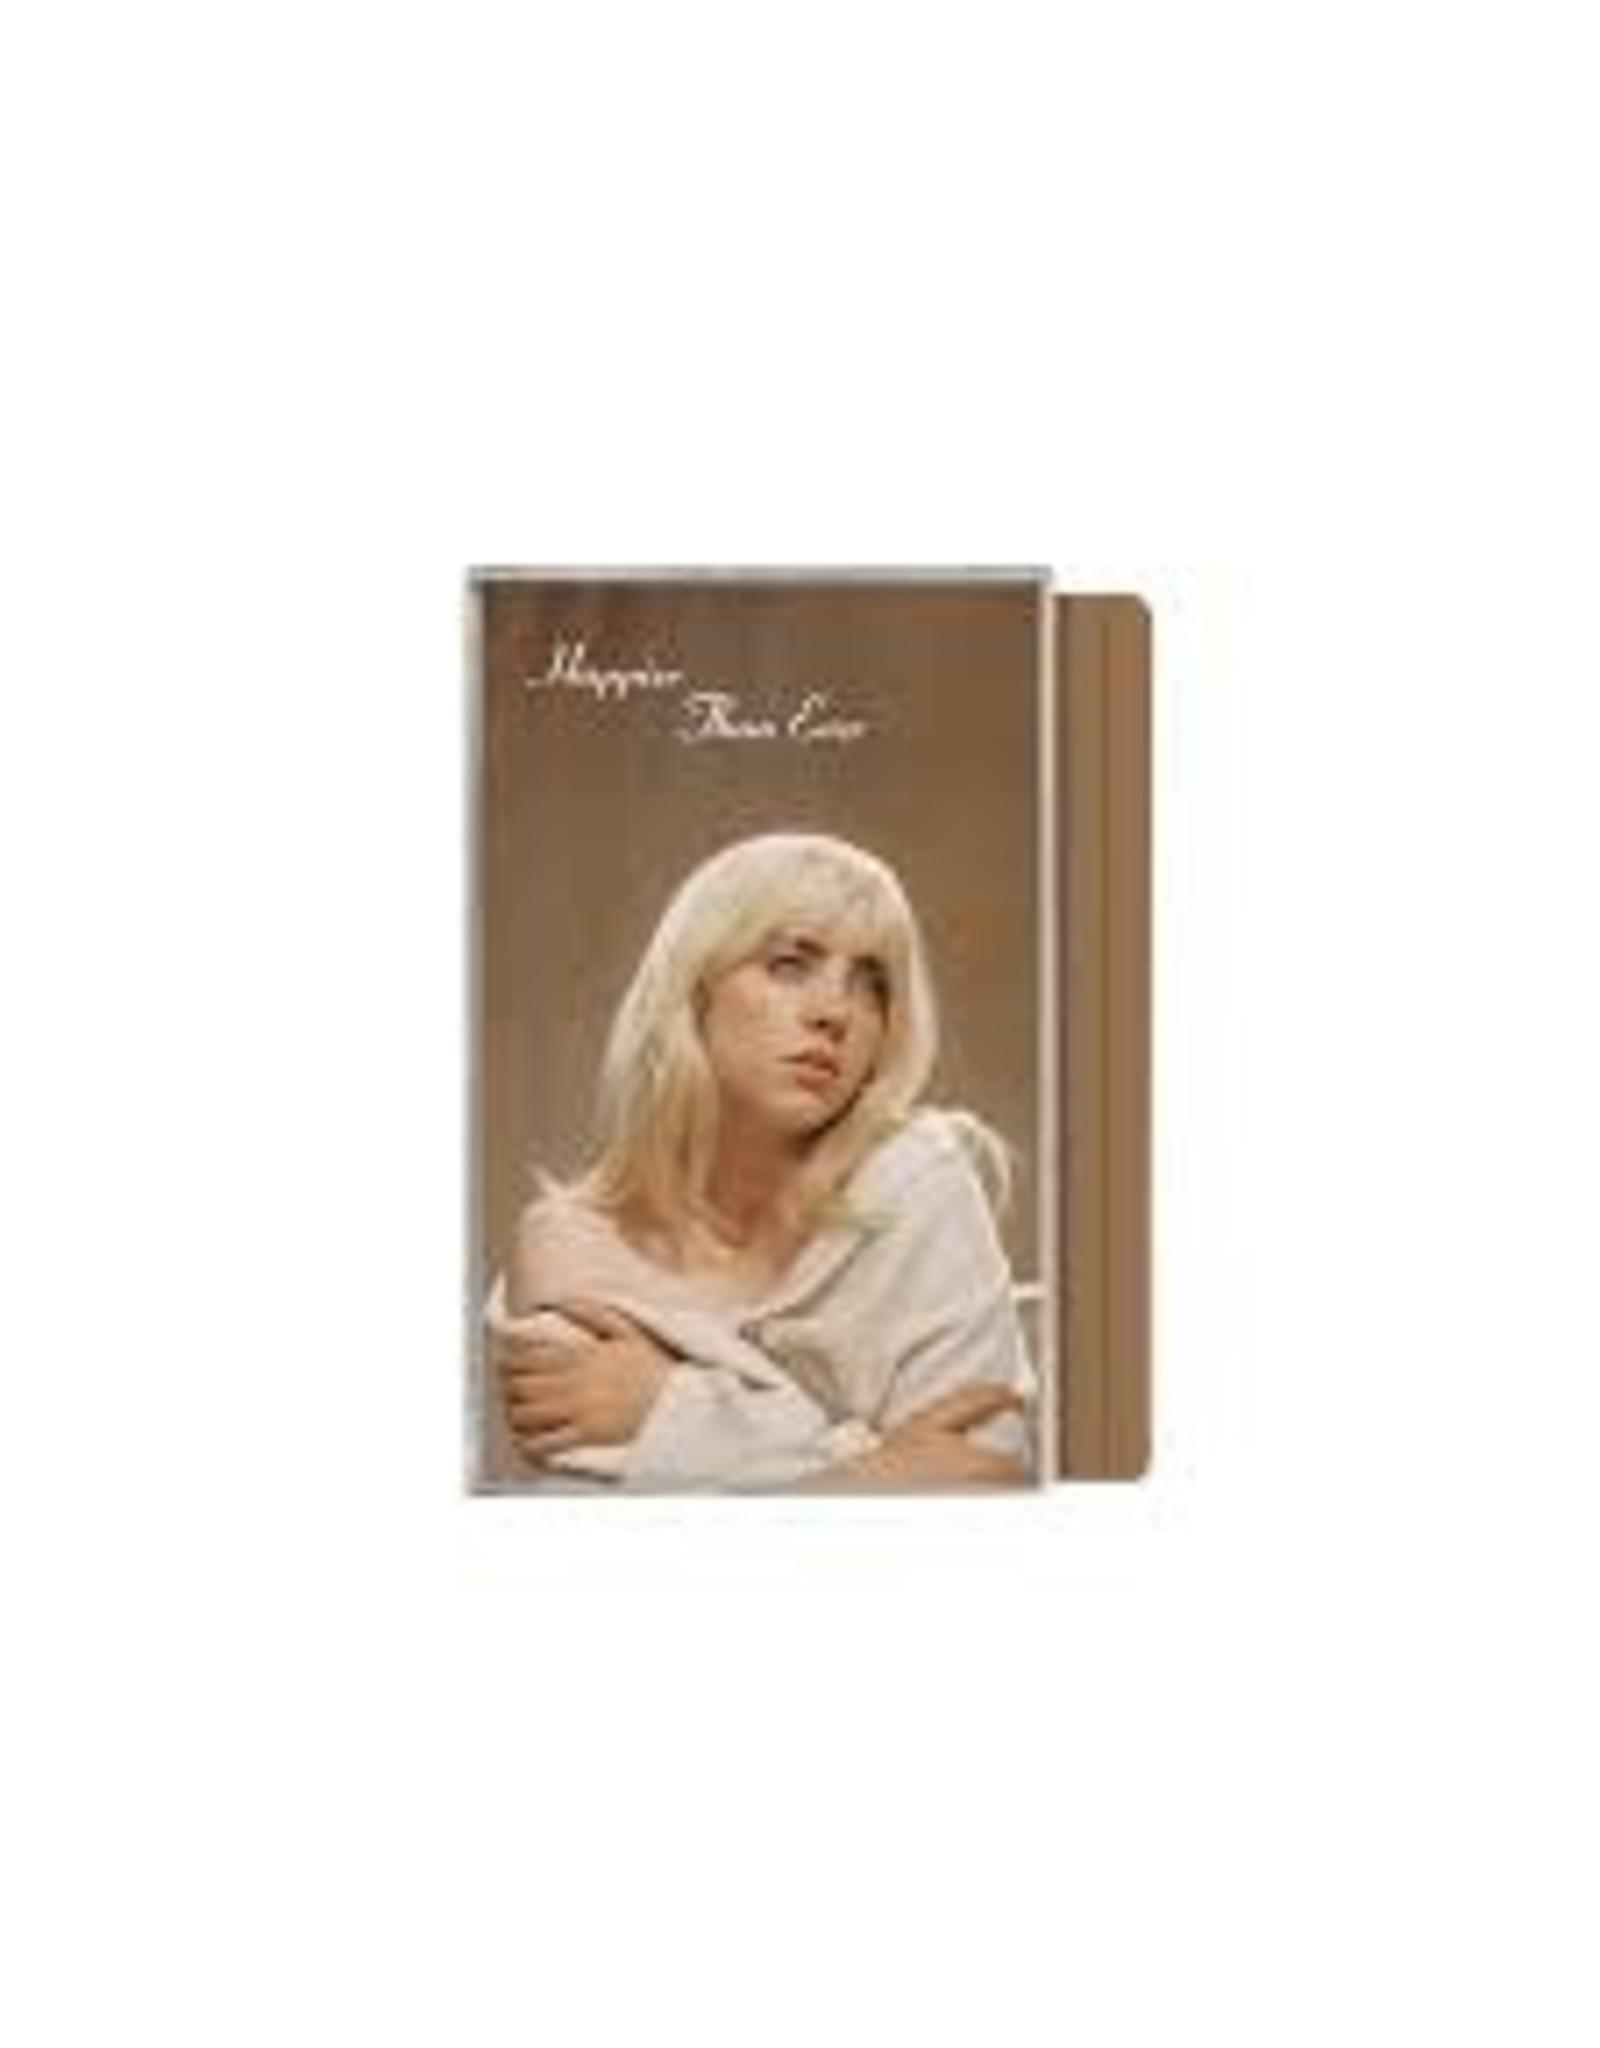 Eilish, Billie - Happier Than Ever Cassette